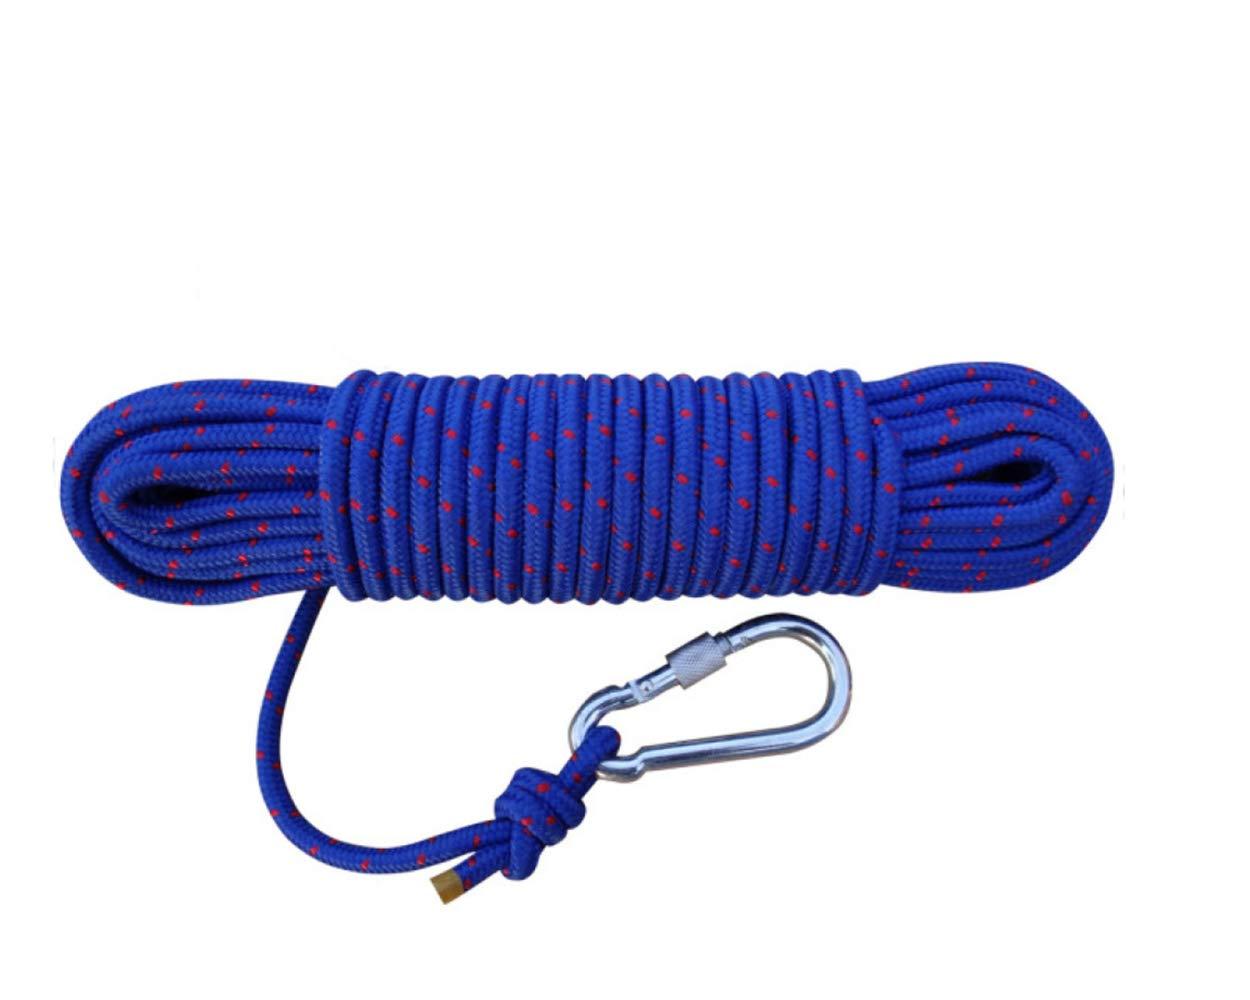 ZAIYI-Climbing rope Outdoor-Klettern Hilfs Sicherheit Rettungsleine Rettungsleine Rettungsleine Verschleiß Haltbarkeit 8mm,Blau-8mm10m B07NVJLBCW Reepschnüre Online 3d7307